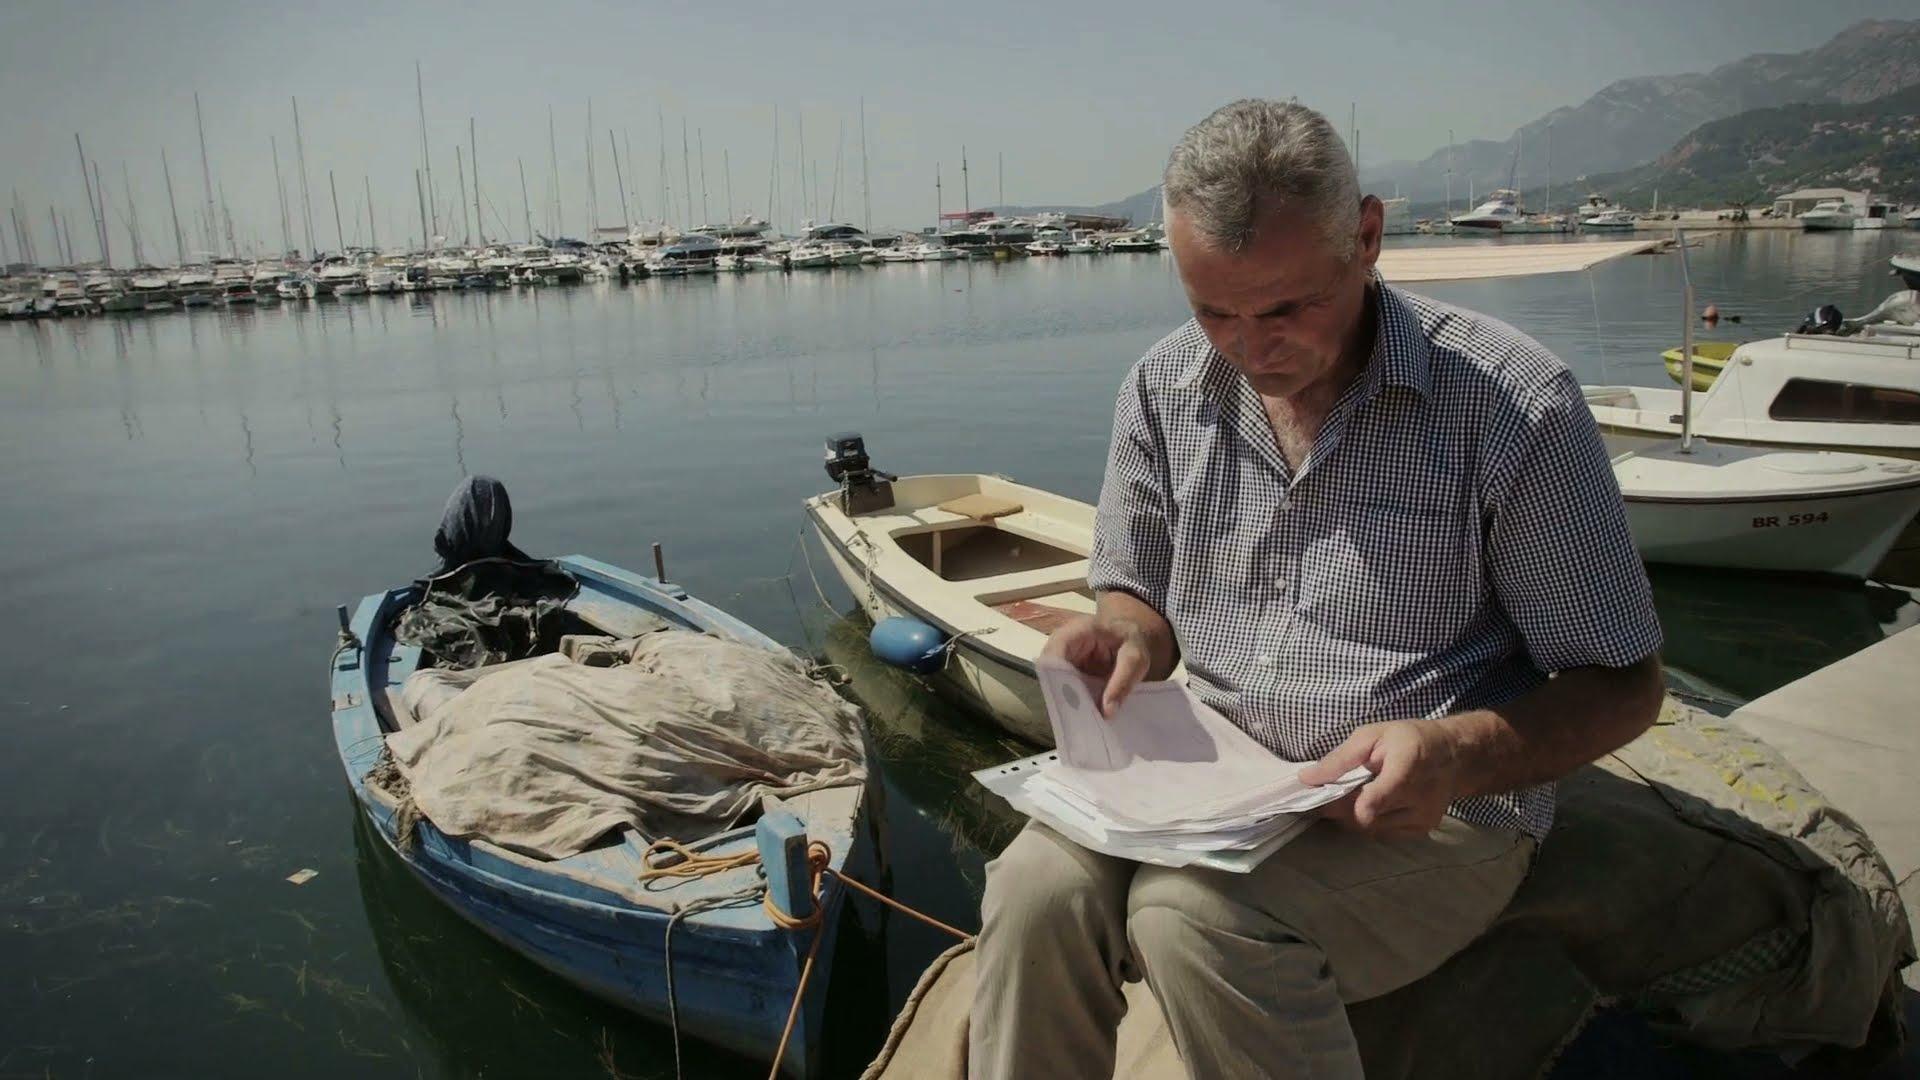 Stateless in Montenegro